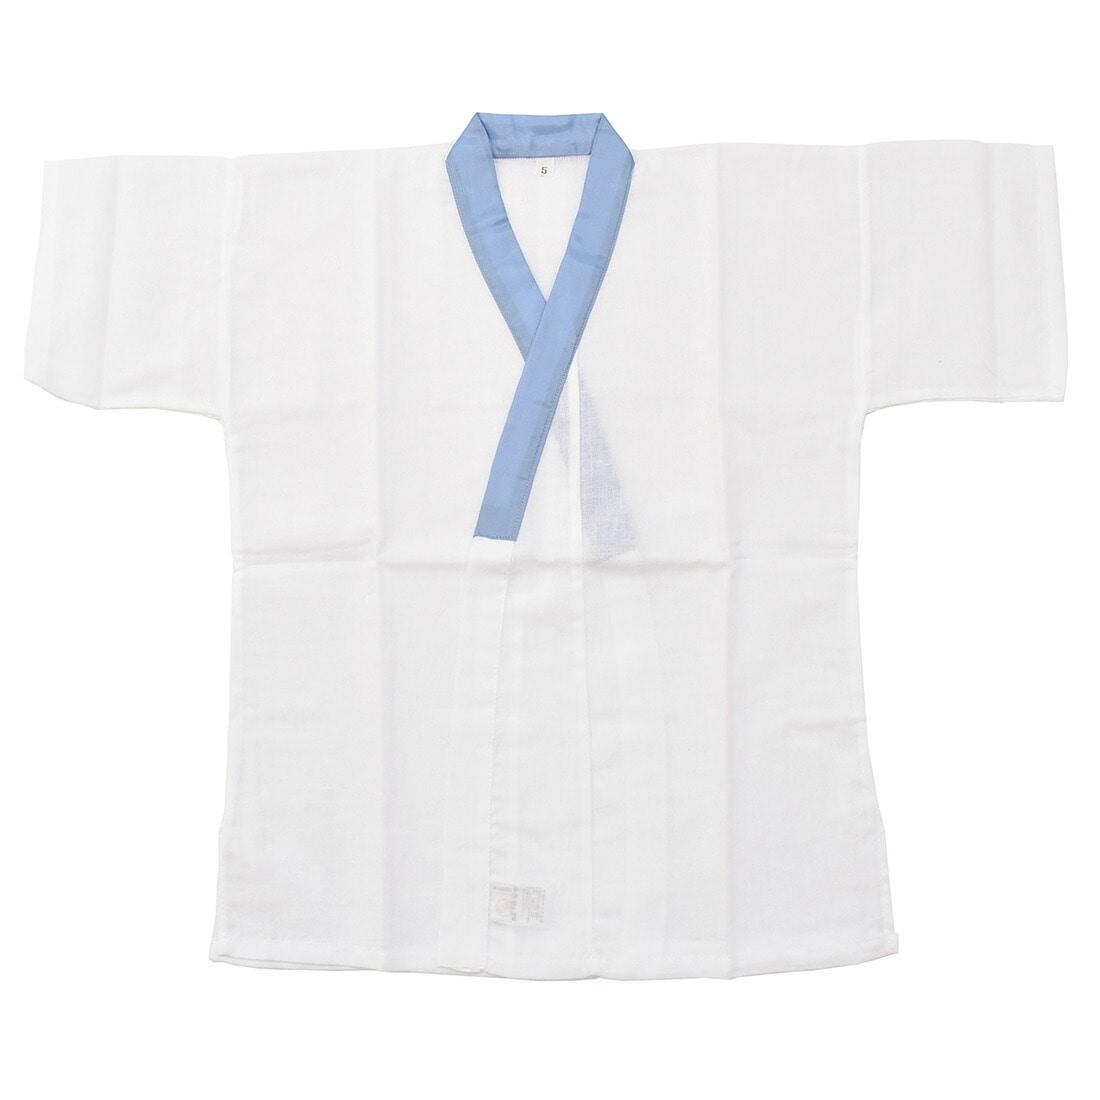 七五三 和装下着 日本製 子供用 肌着 青衿 5歳用 肌襦袢 礼装 おしゃれ 通年用 子供 男の子 男児【JS10】